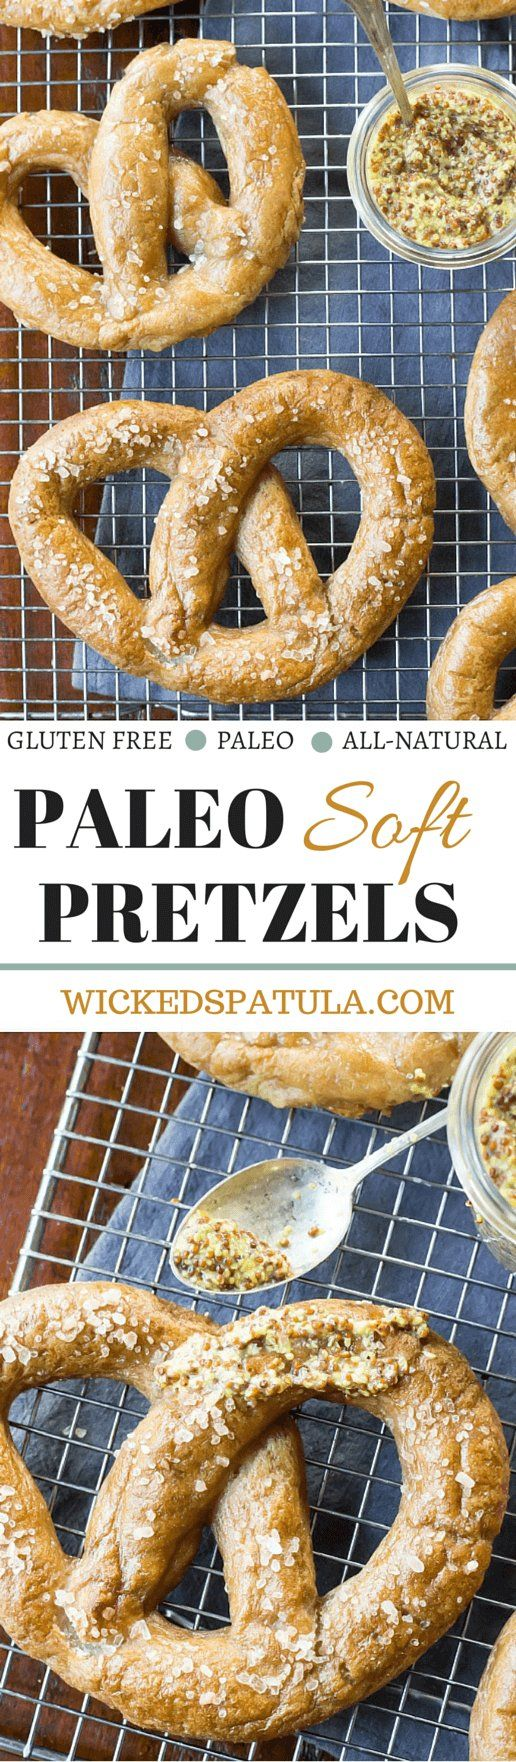 Paleo Pretzels - Just like Auntie Ann's! | wickedspatula.com